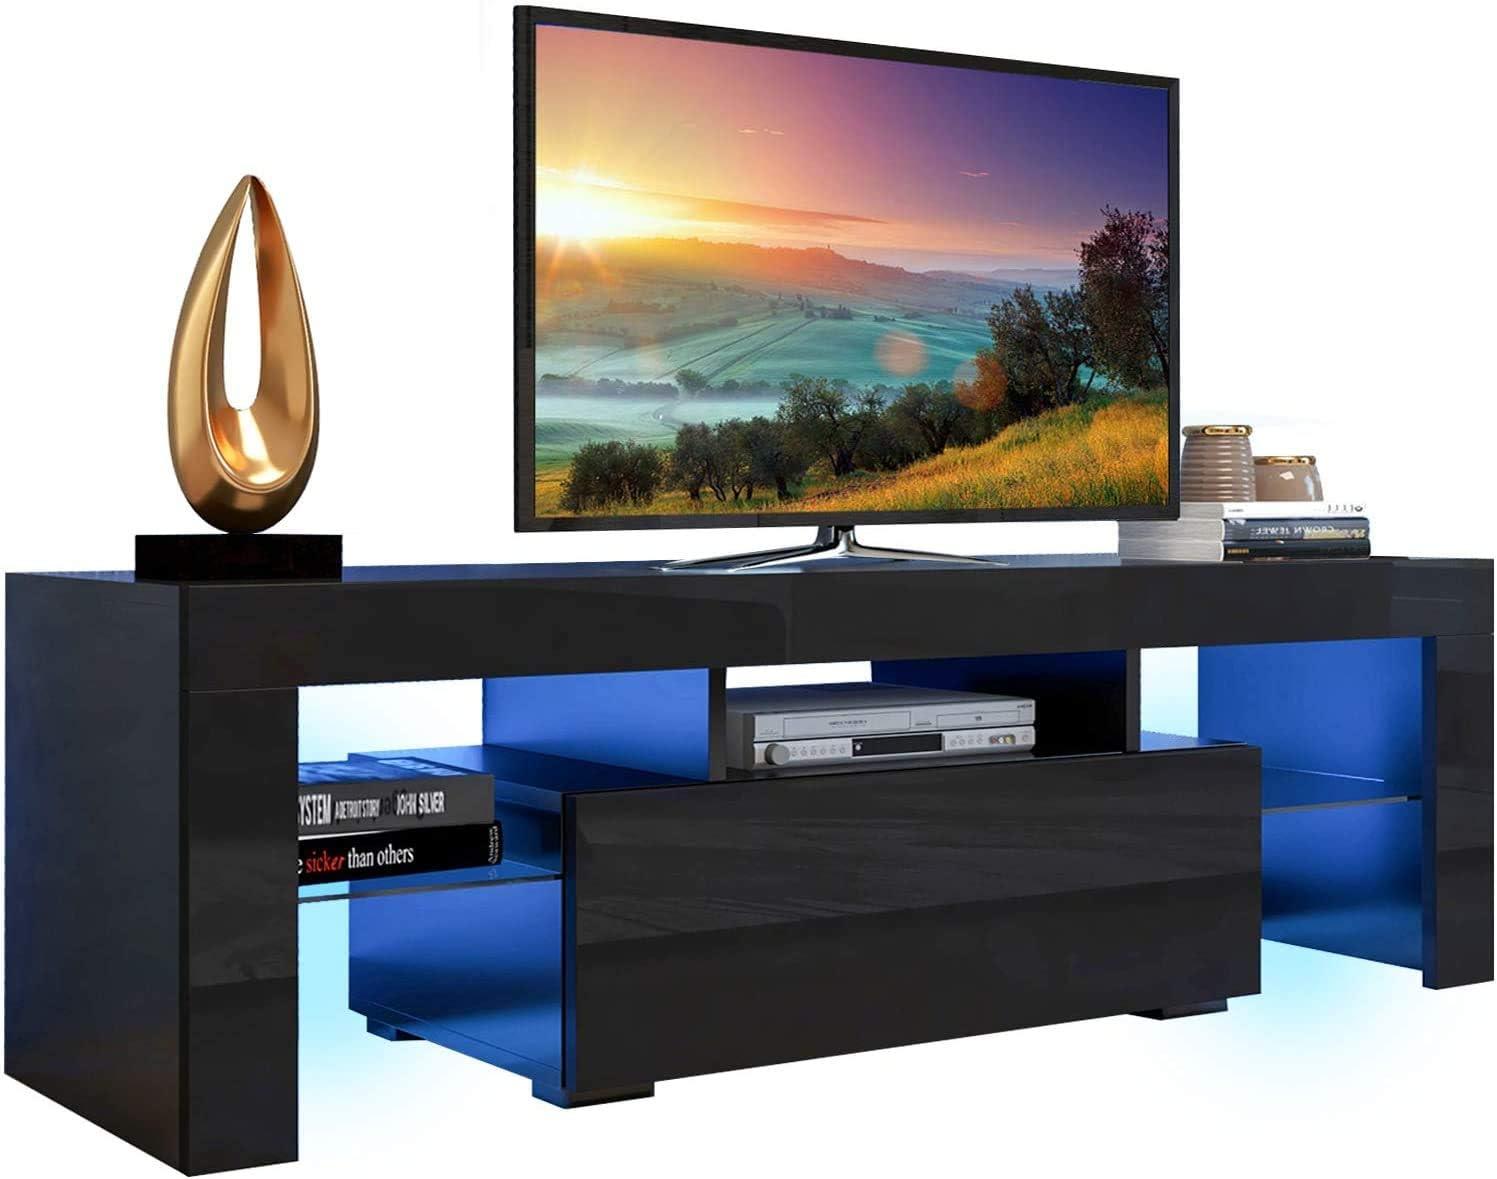 AUTSCA TV Stand